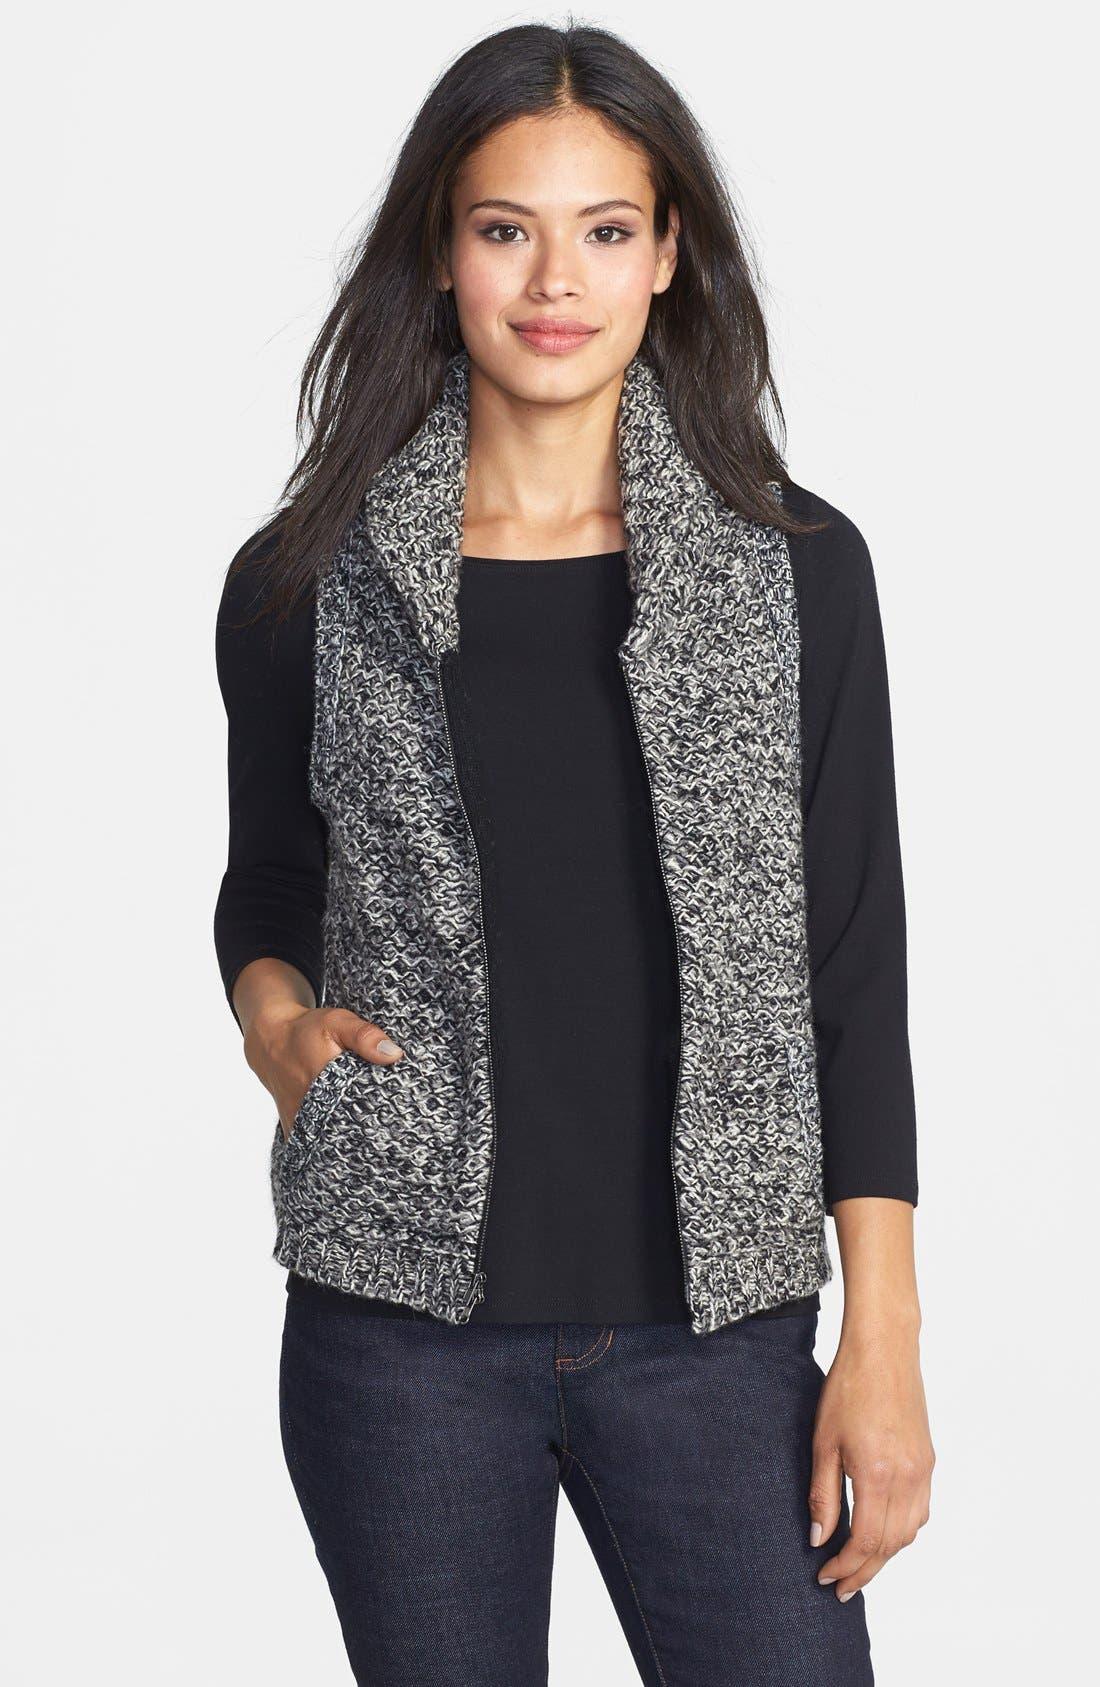 Alternate Image 1 Selected - Eileen Fisher Merino & Yak Wool Sweater Vest (Regular & Petite)